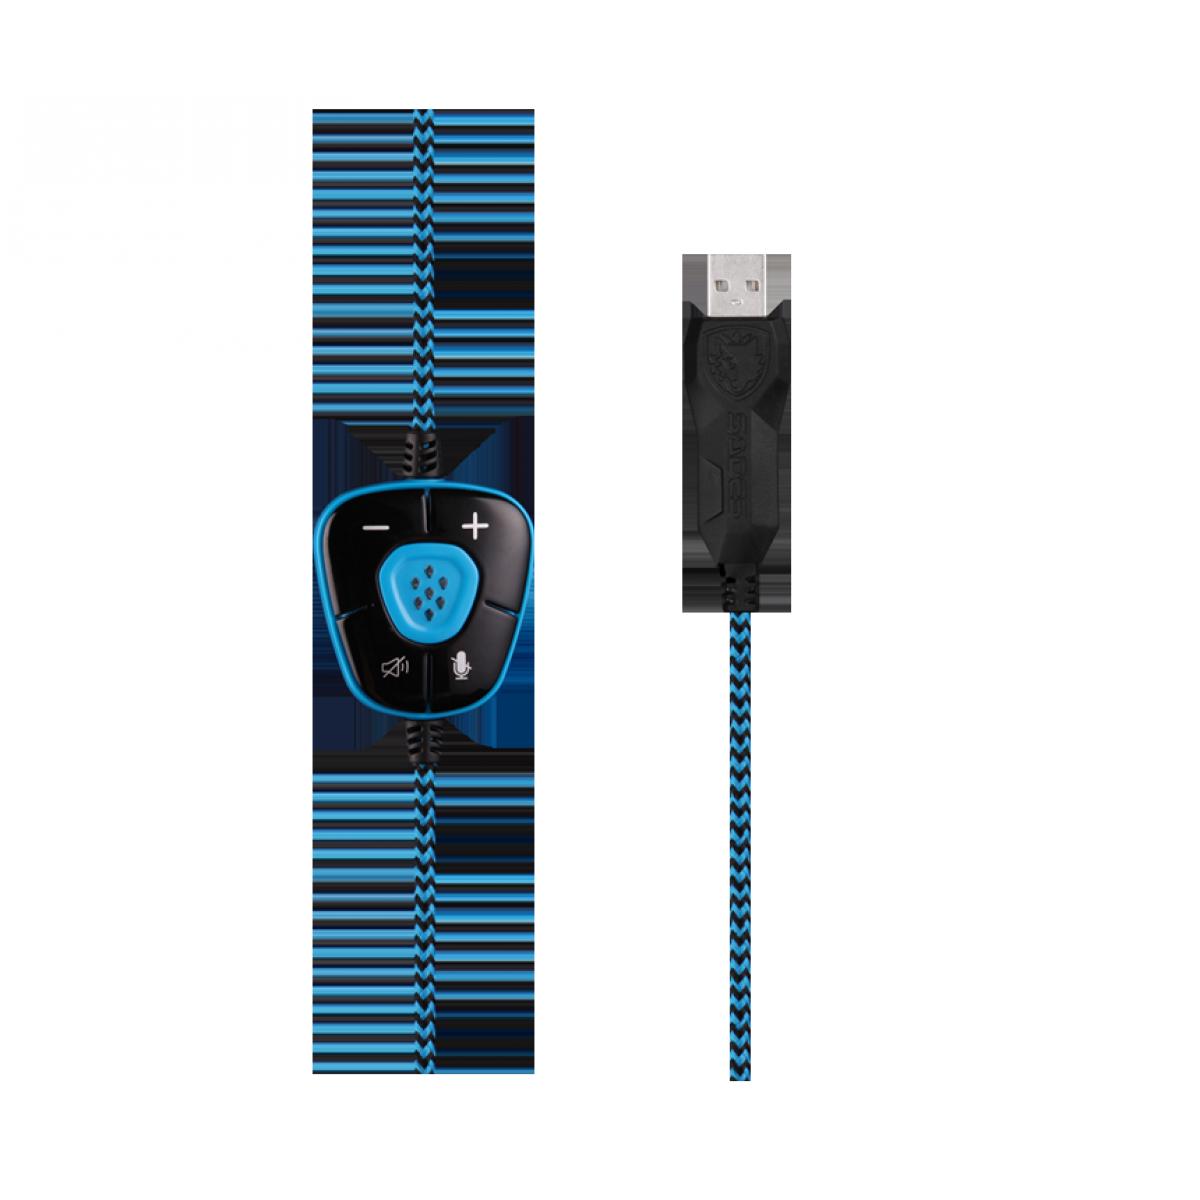 Headset Gamer Sades Sa-902 Snuk, Surround 7.1, Black/Blue, Sa-902